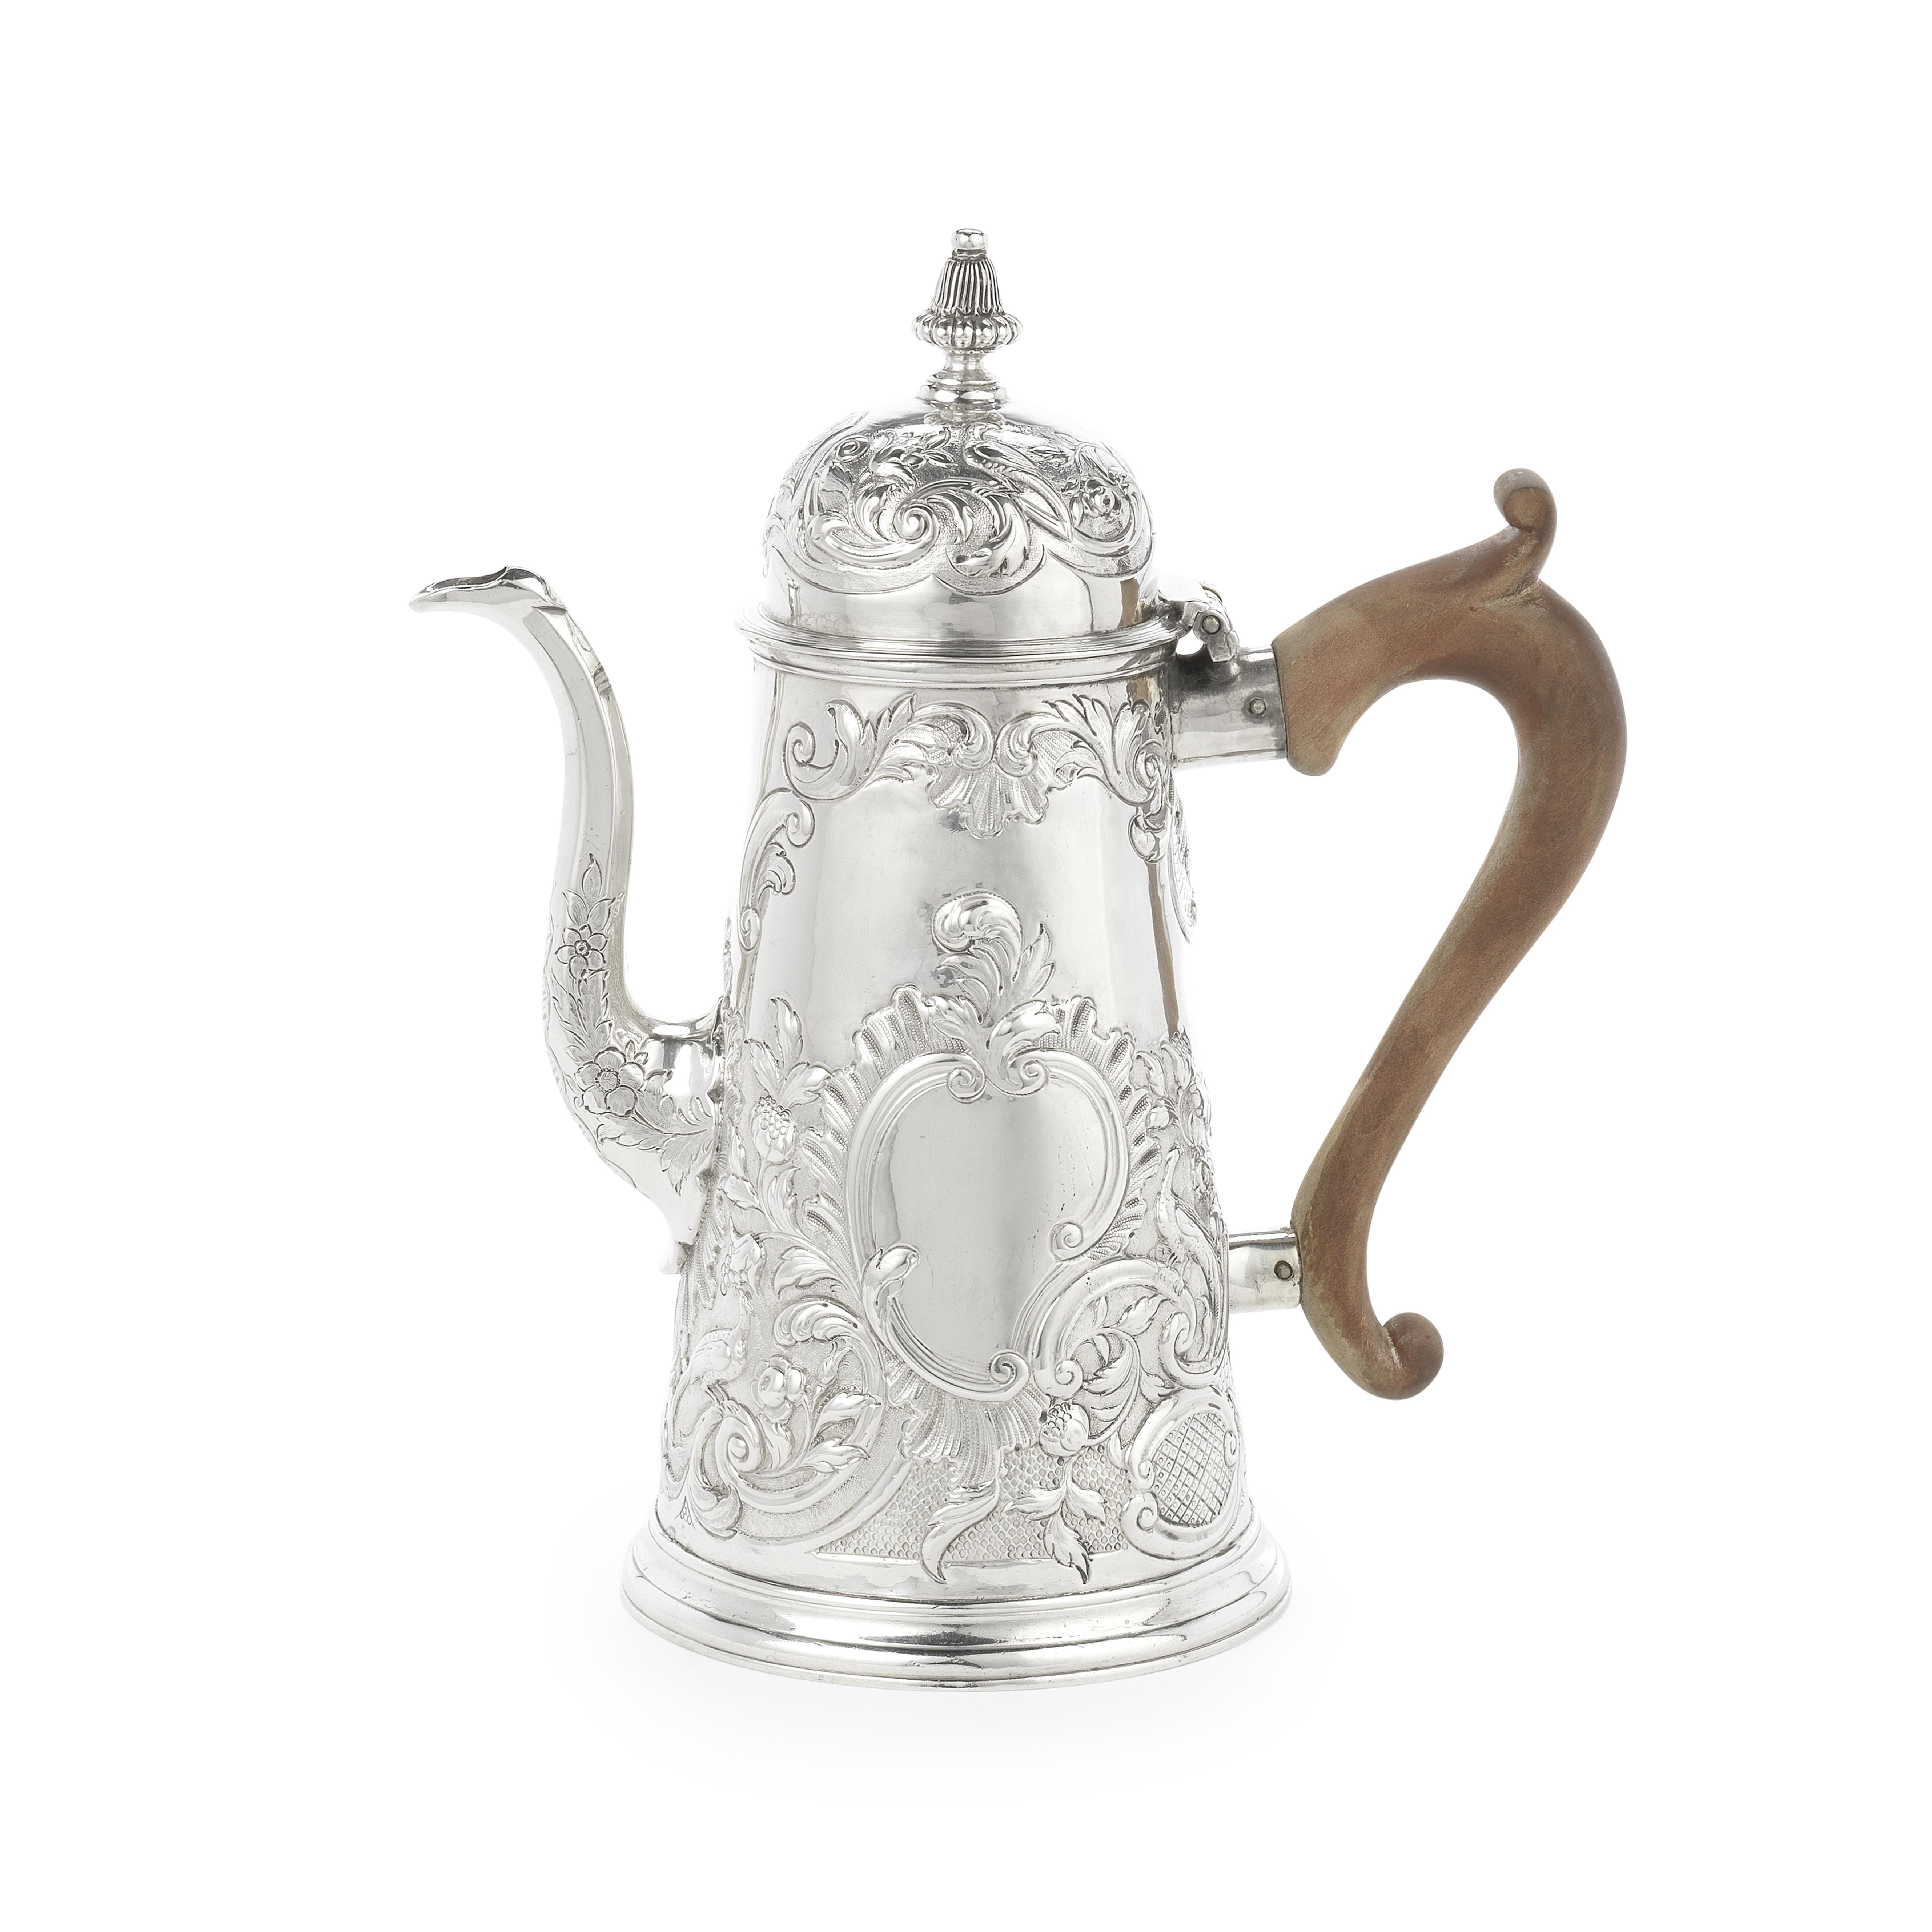 A George I silver coffee pot Edward Yorke, London 1714